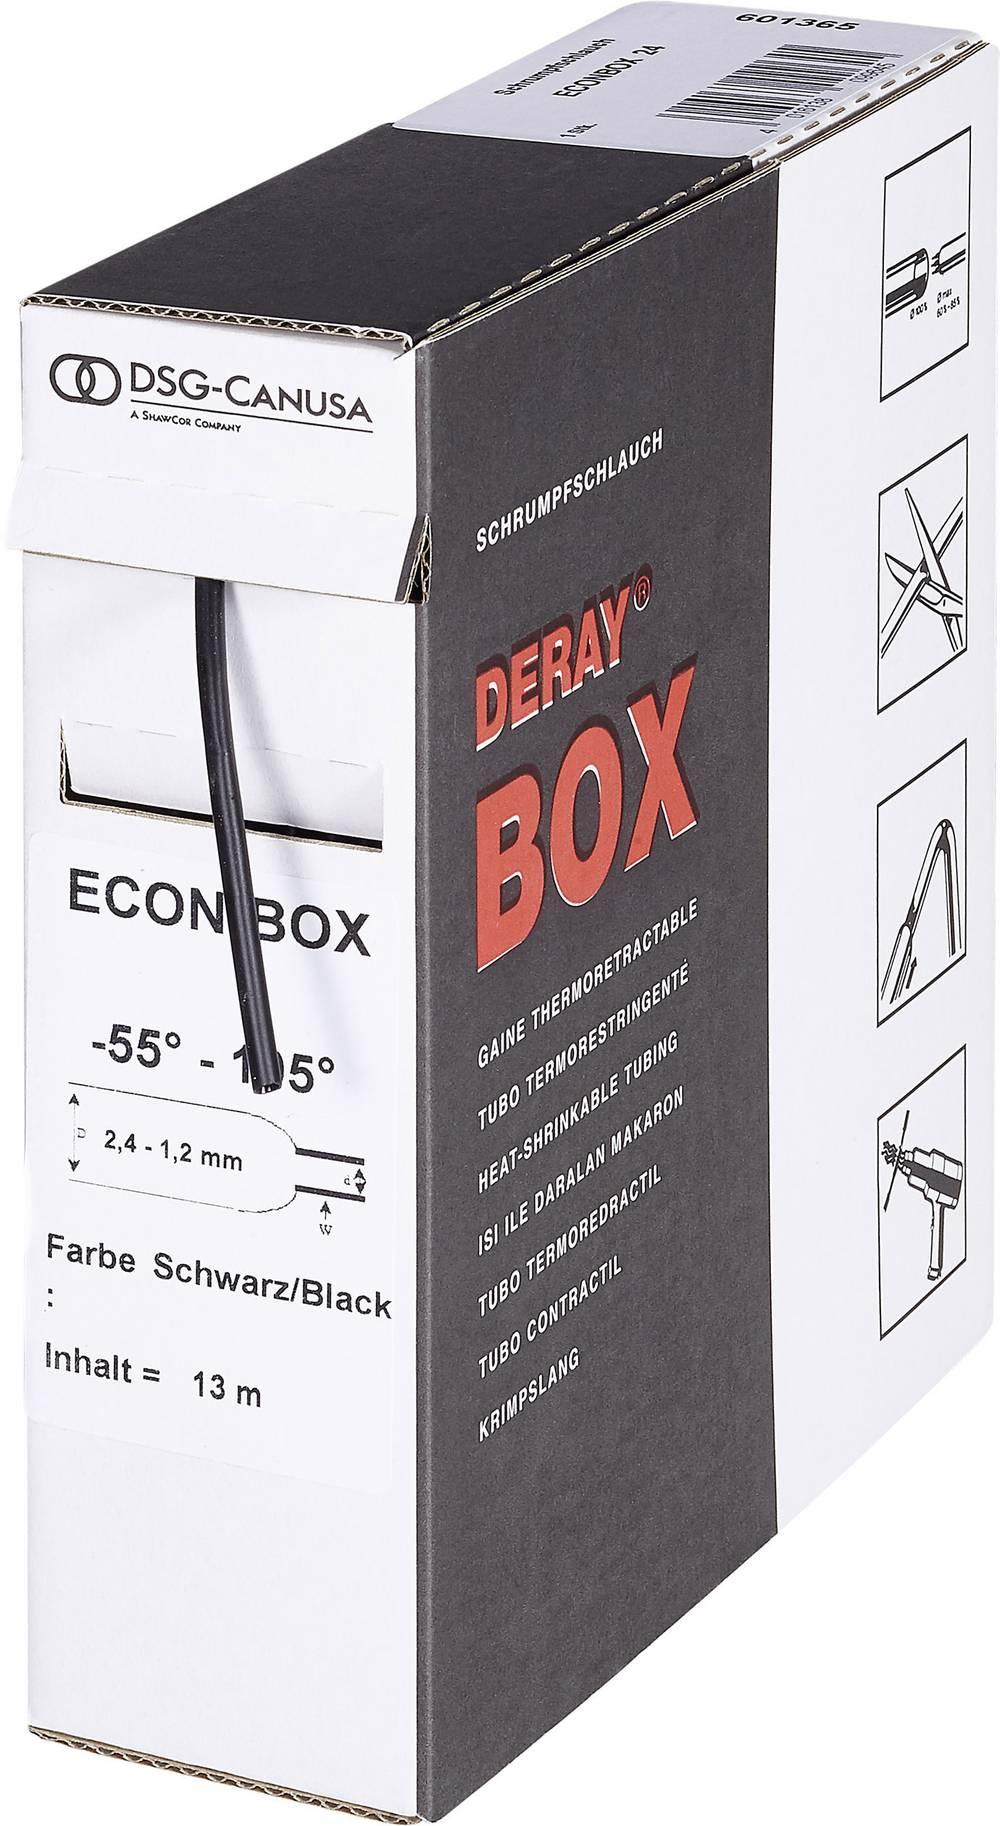 Schrumpfschlauch-Box 3:1 DSG Canusa 8620060956